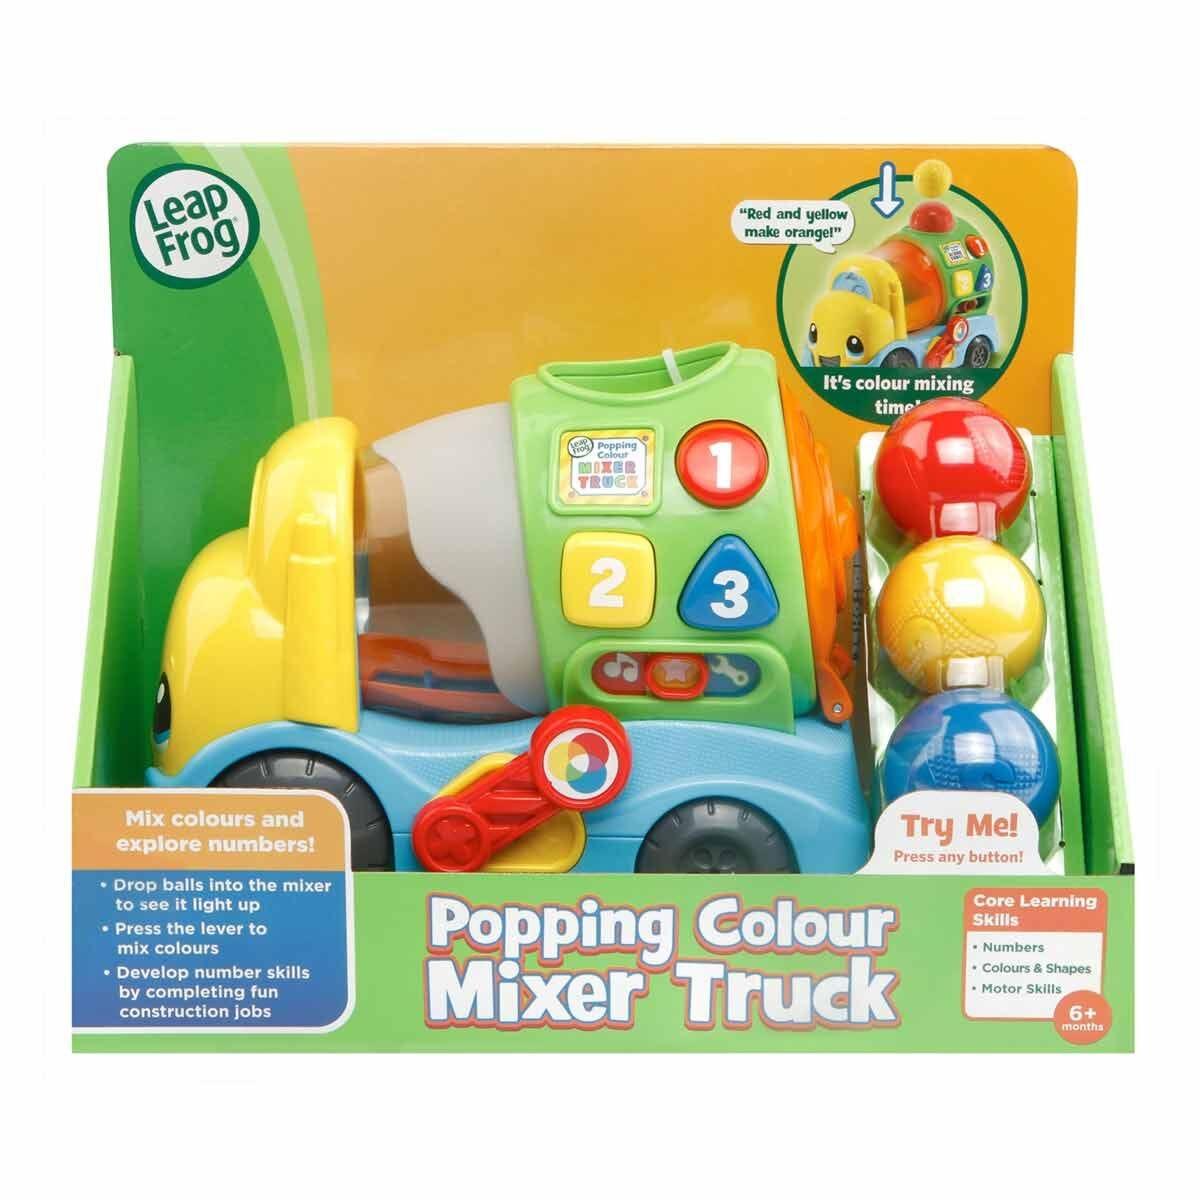 Leapfrog Popping Colour Mixer Truck